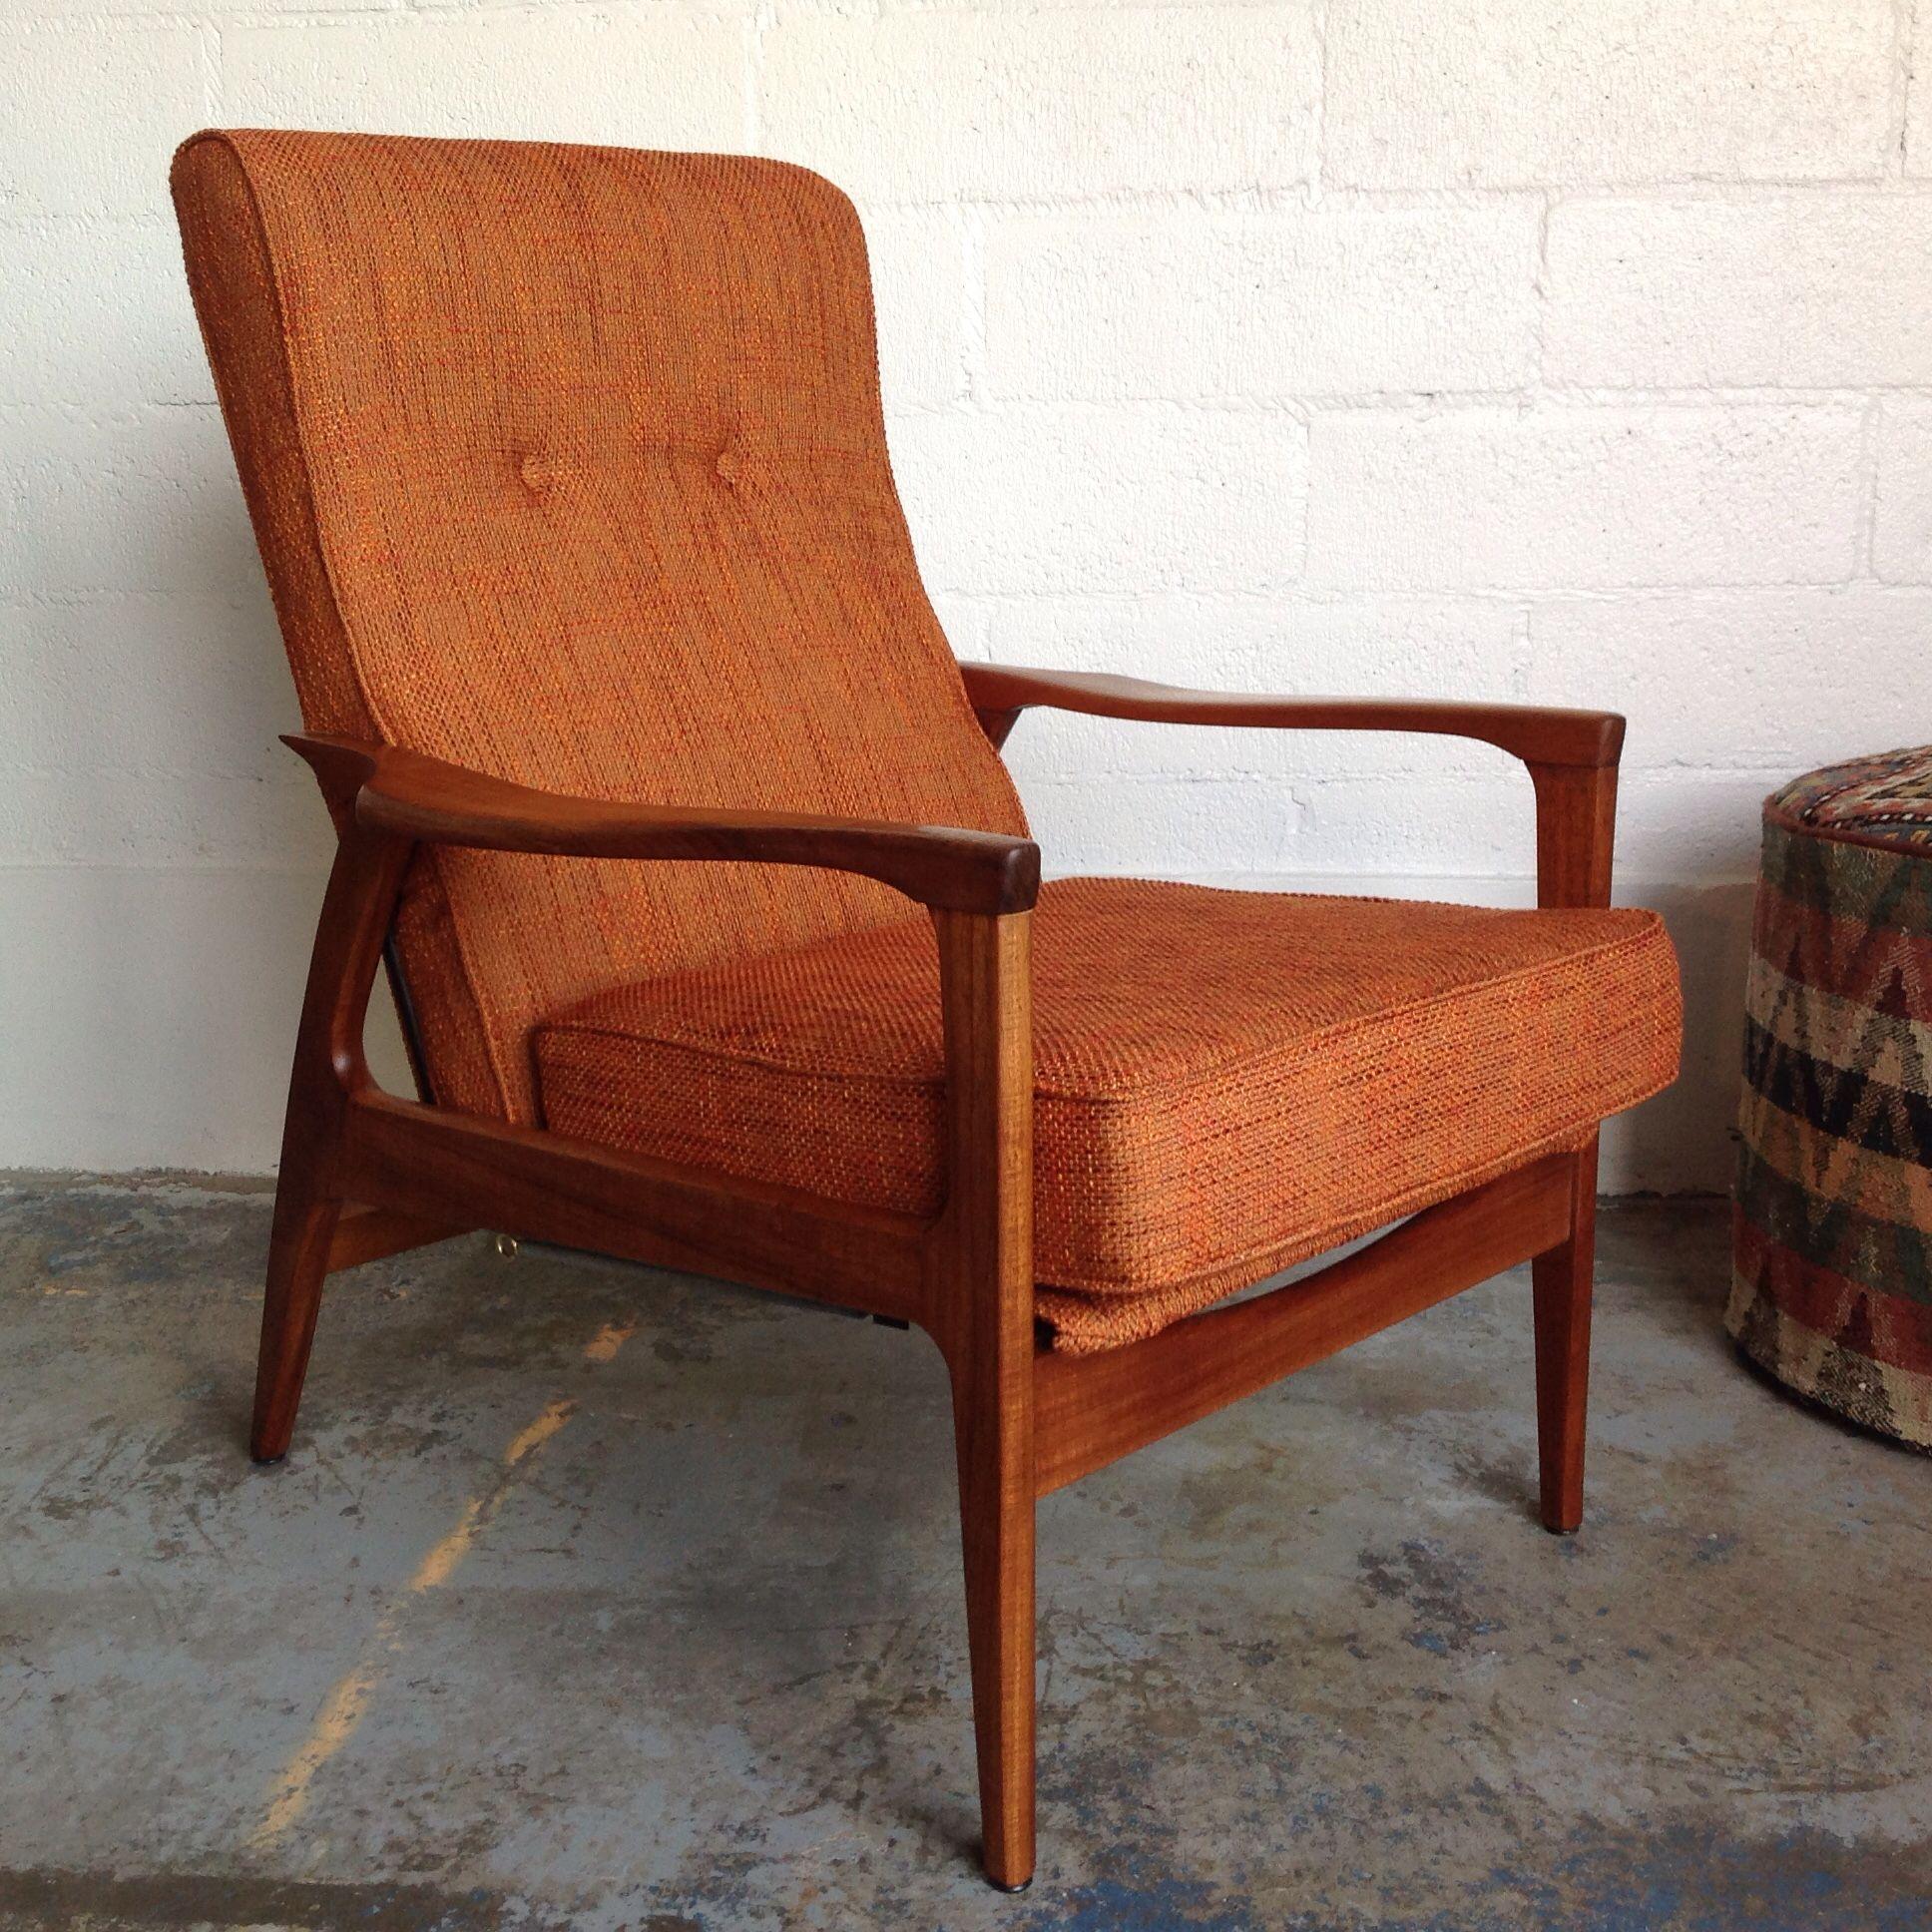 Surprising Don Rex Recliner Tv Arm Chair C 1960S Designsmith Complete Short Links Chair Design For Home Short Linksinfo